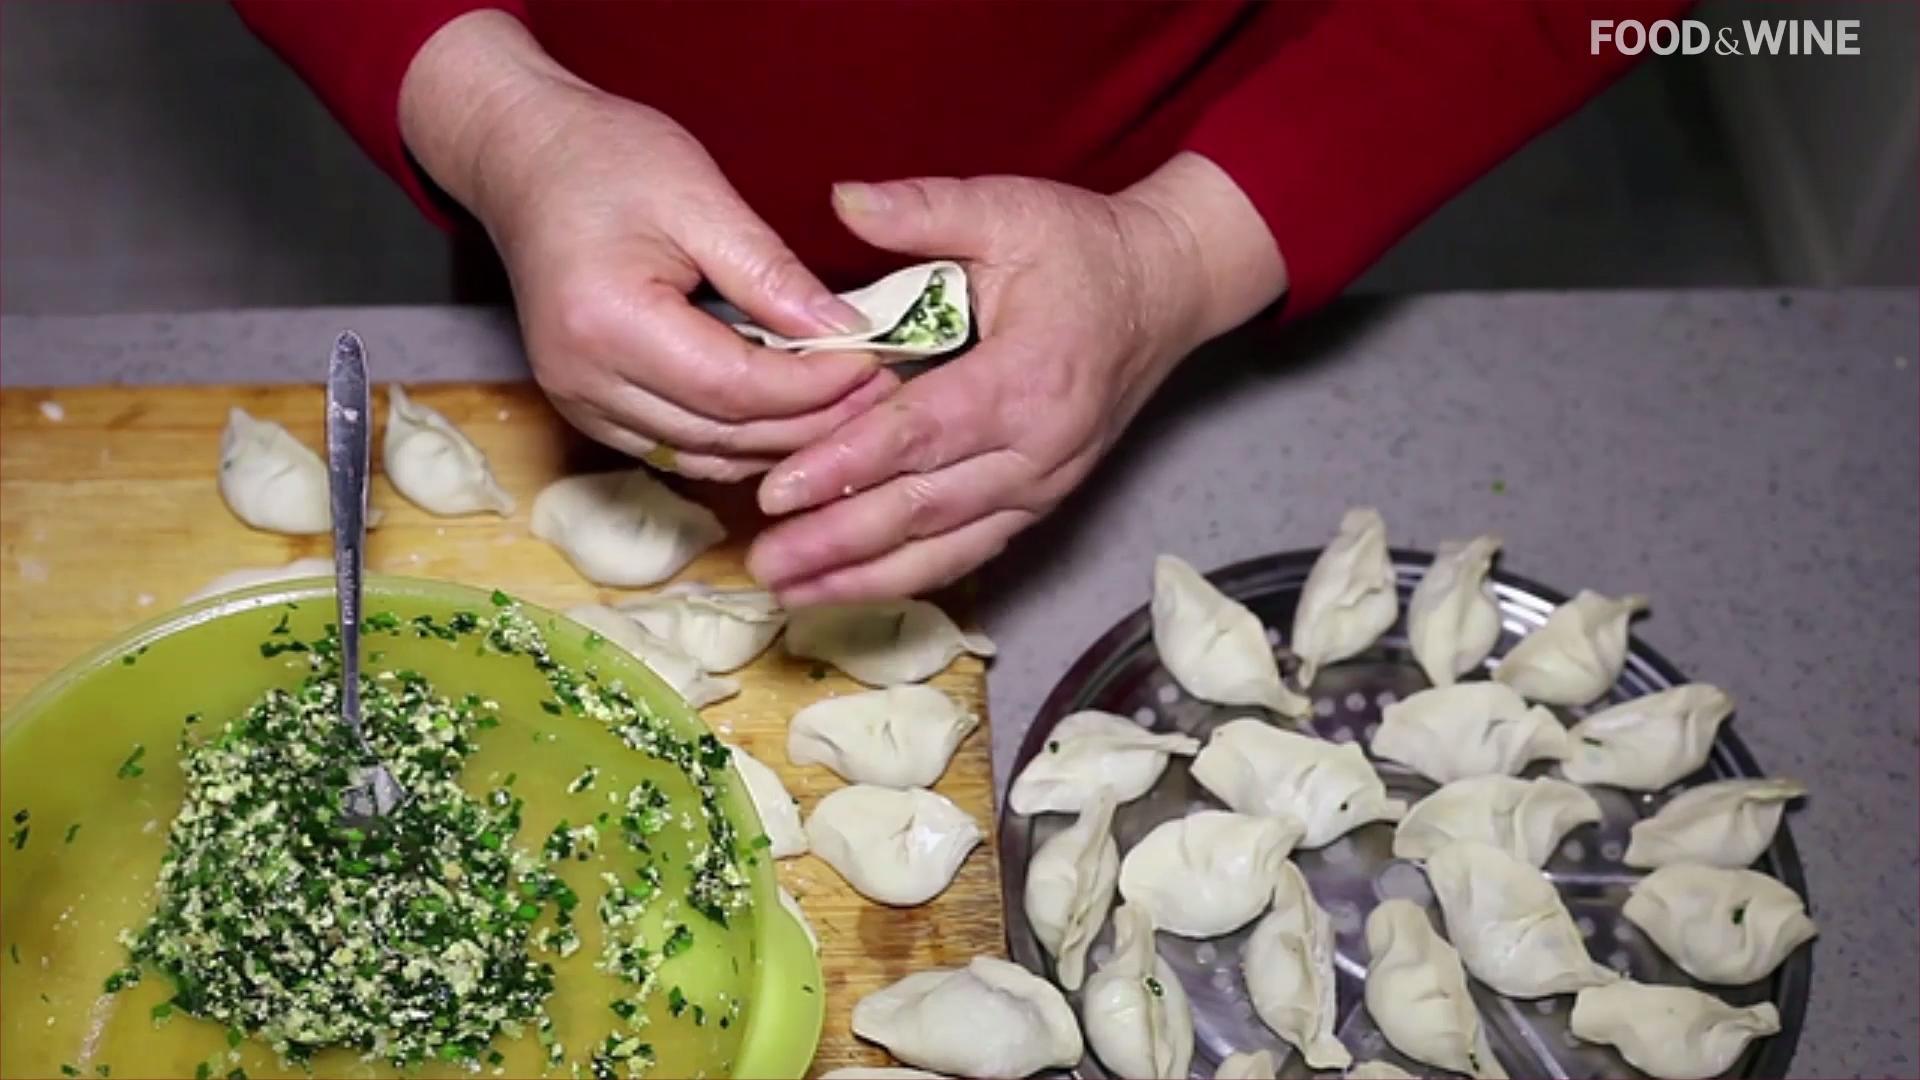 Everything You Need to Make Dumplings